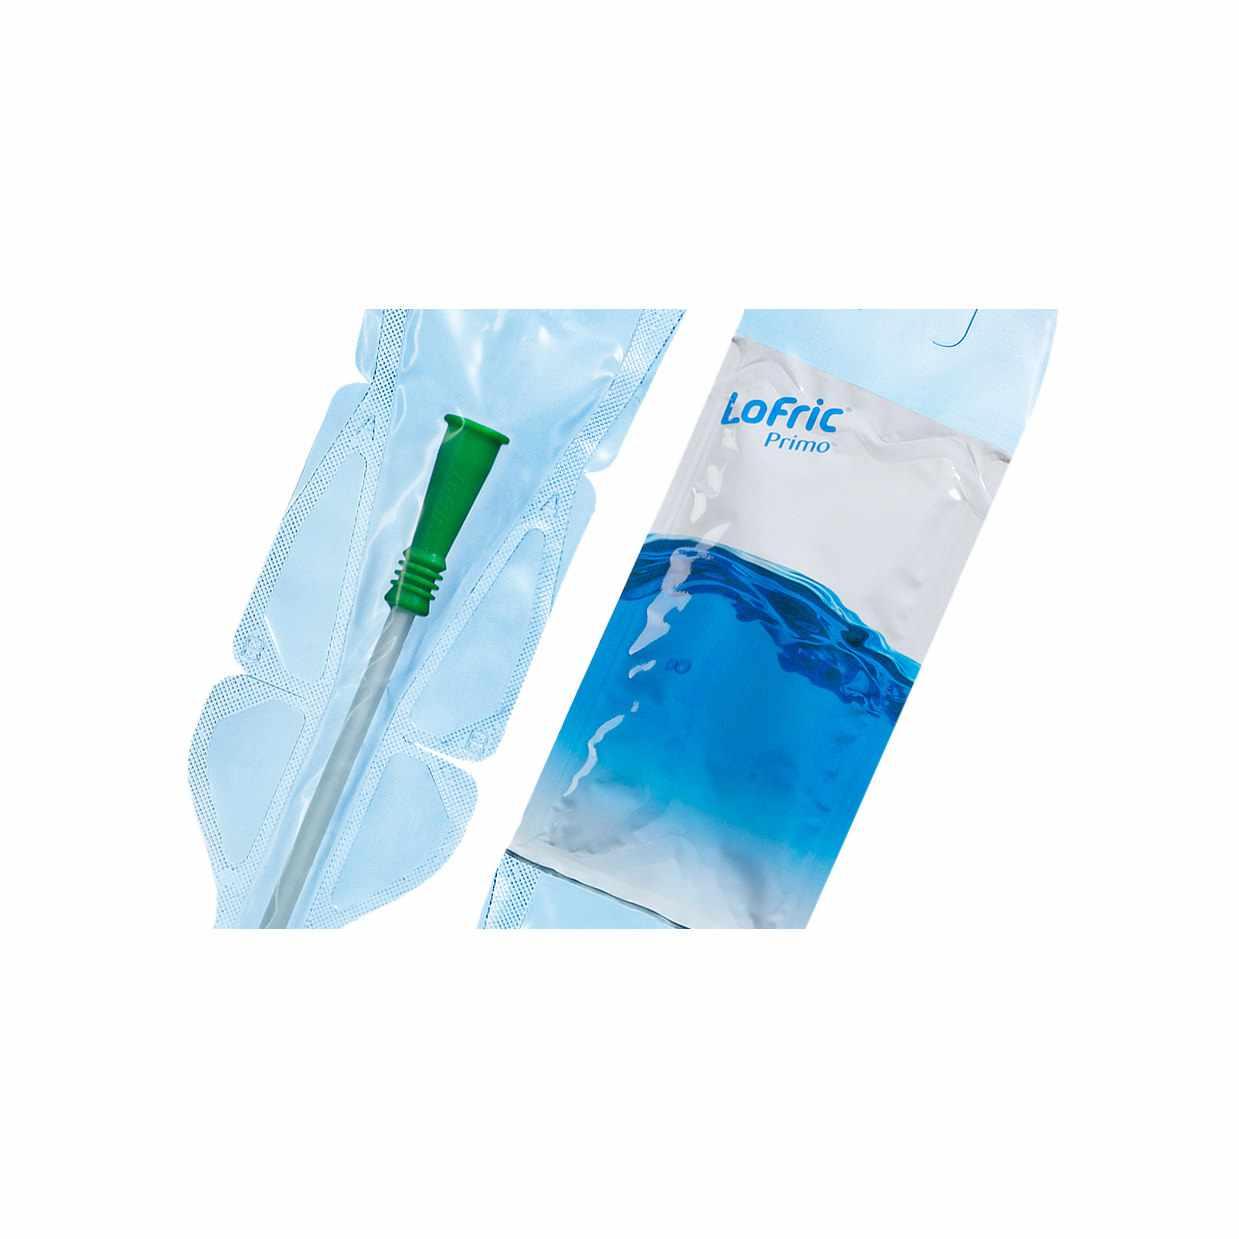 "Wellspect LoFric Primo Female Hydrophilic Intermittent Catheter,12 Fr, 6"""